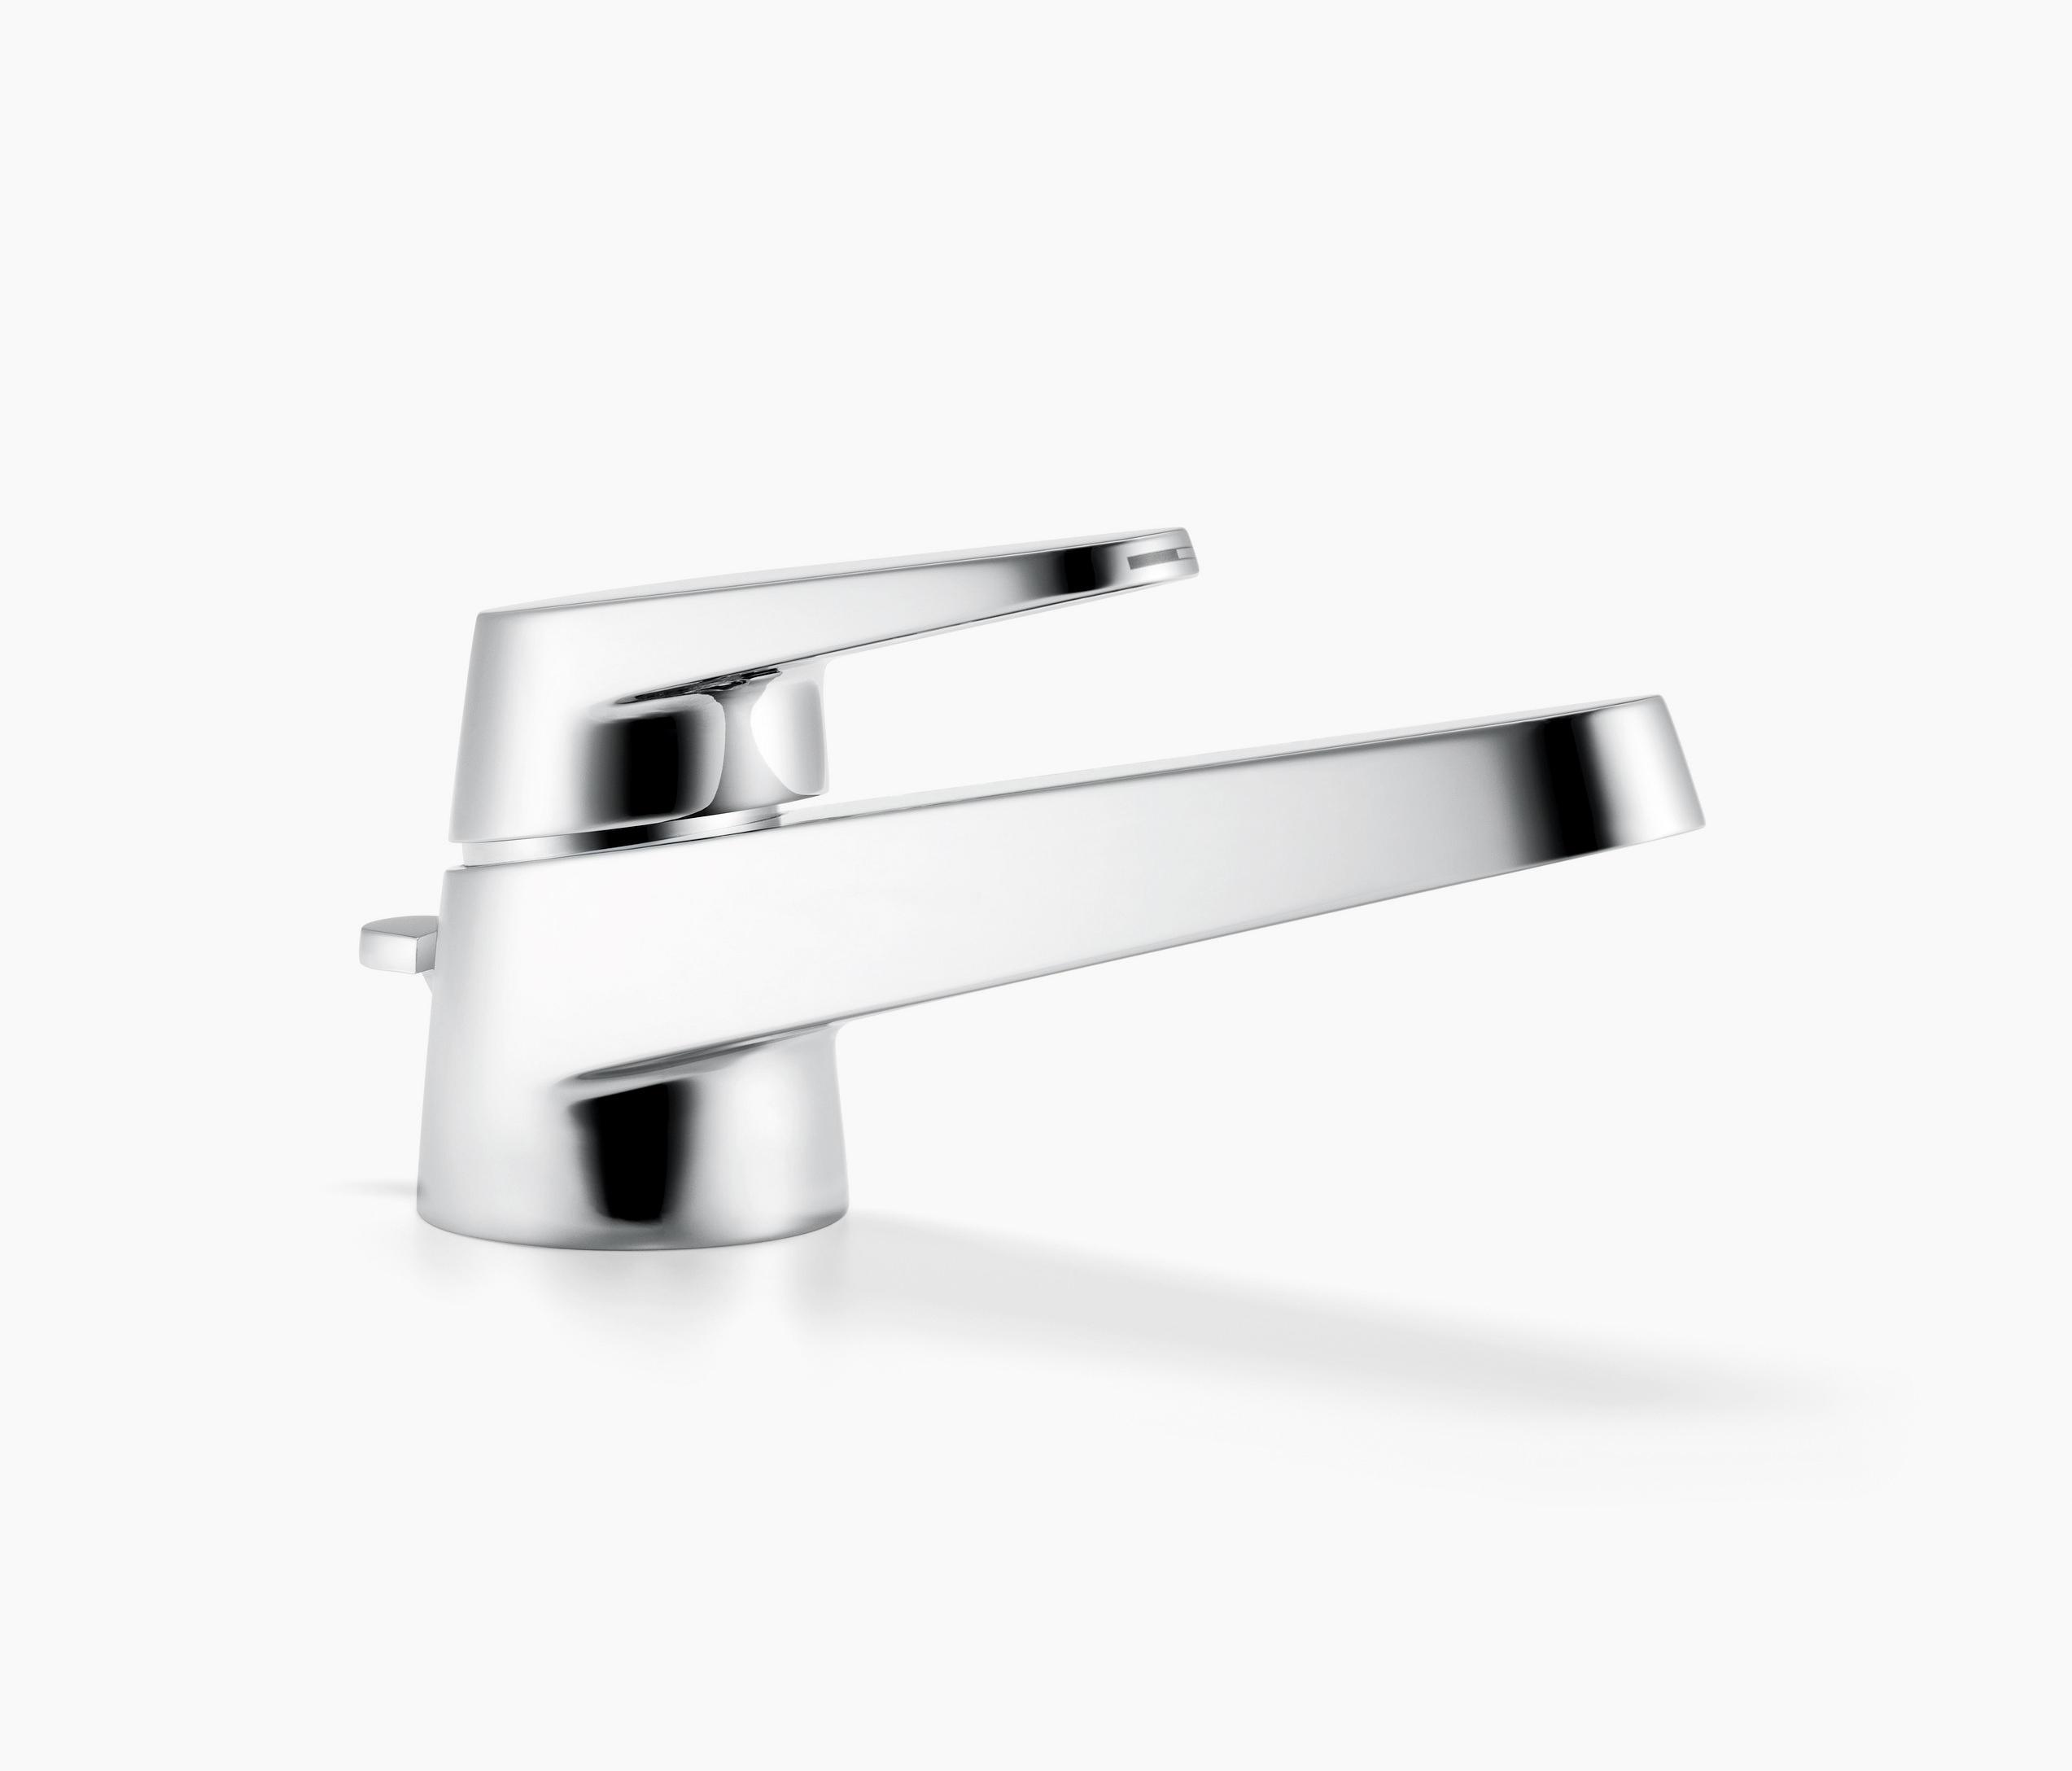 selv single lever basin mixer wash basin taps from dornbracht architonic. Black Bedroom Furniture Sets. Home Design Ideas